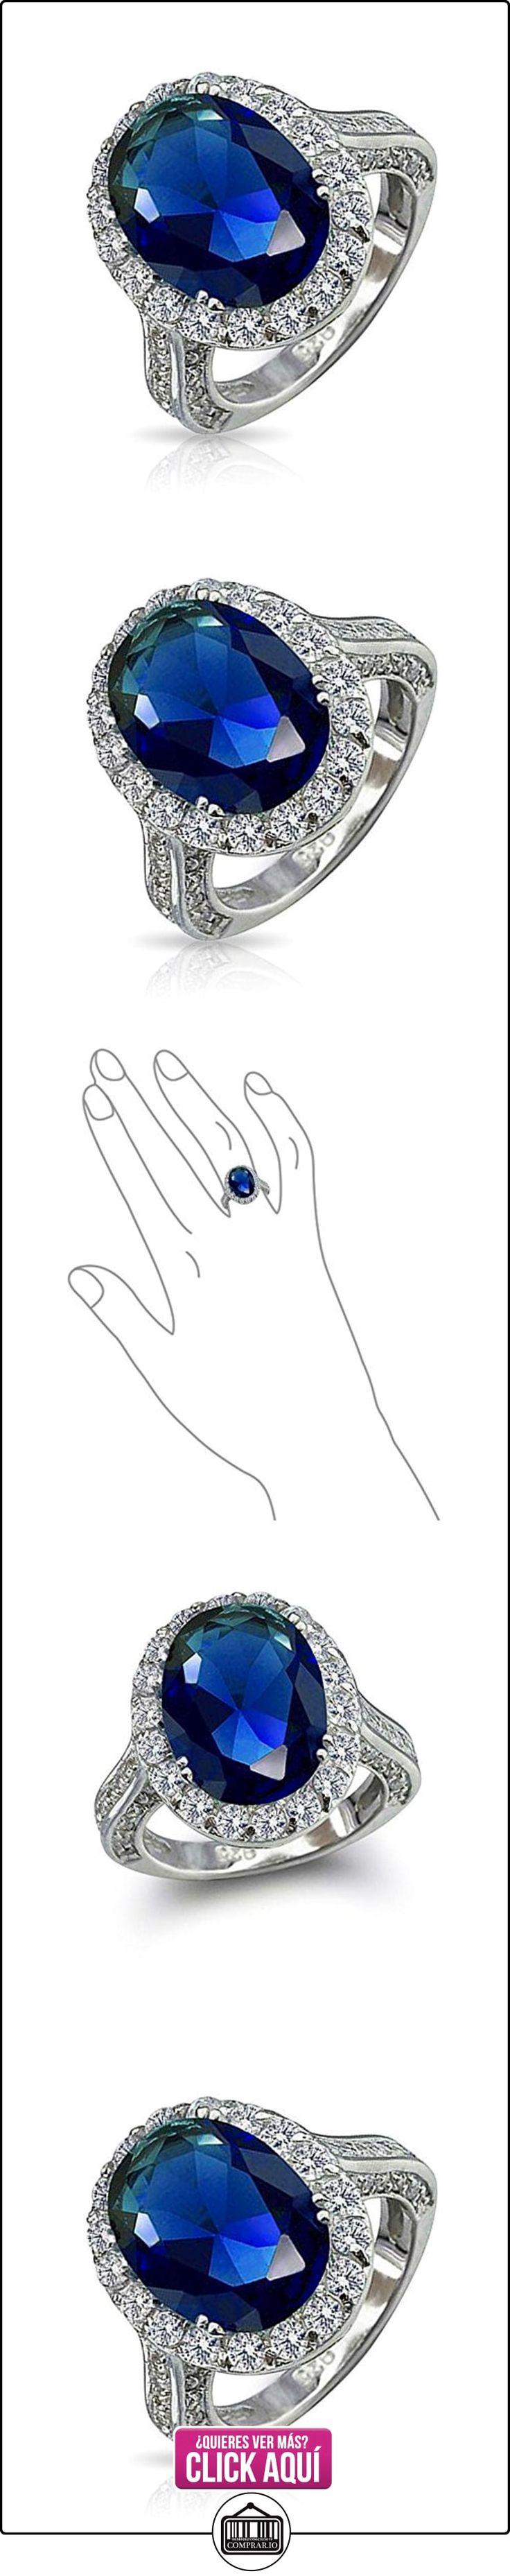 Bling Jewelry Plata Esterlina de Época CZ Oval Color Zafiro Real Anillo de Compromiso  ✿ Joyas para mujer - Las mejores ofertas ✿ ▬► Ver oferta: http://comprar.io/goto/B004T4BQI8